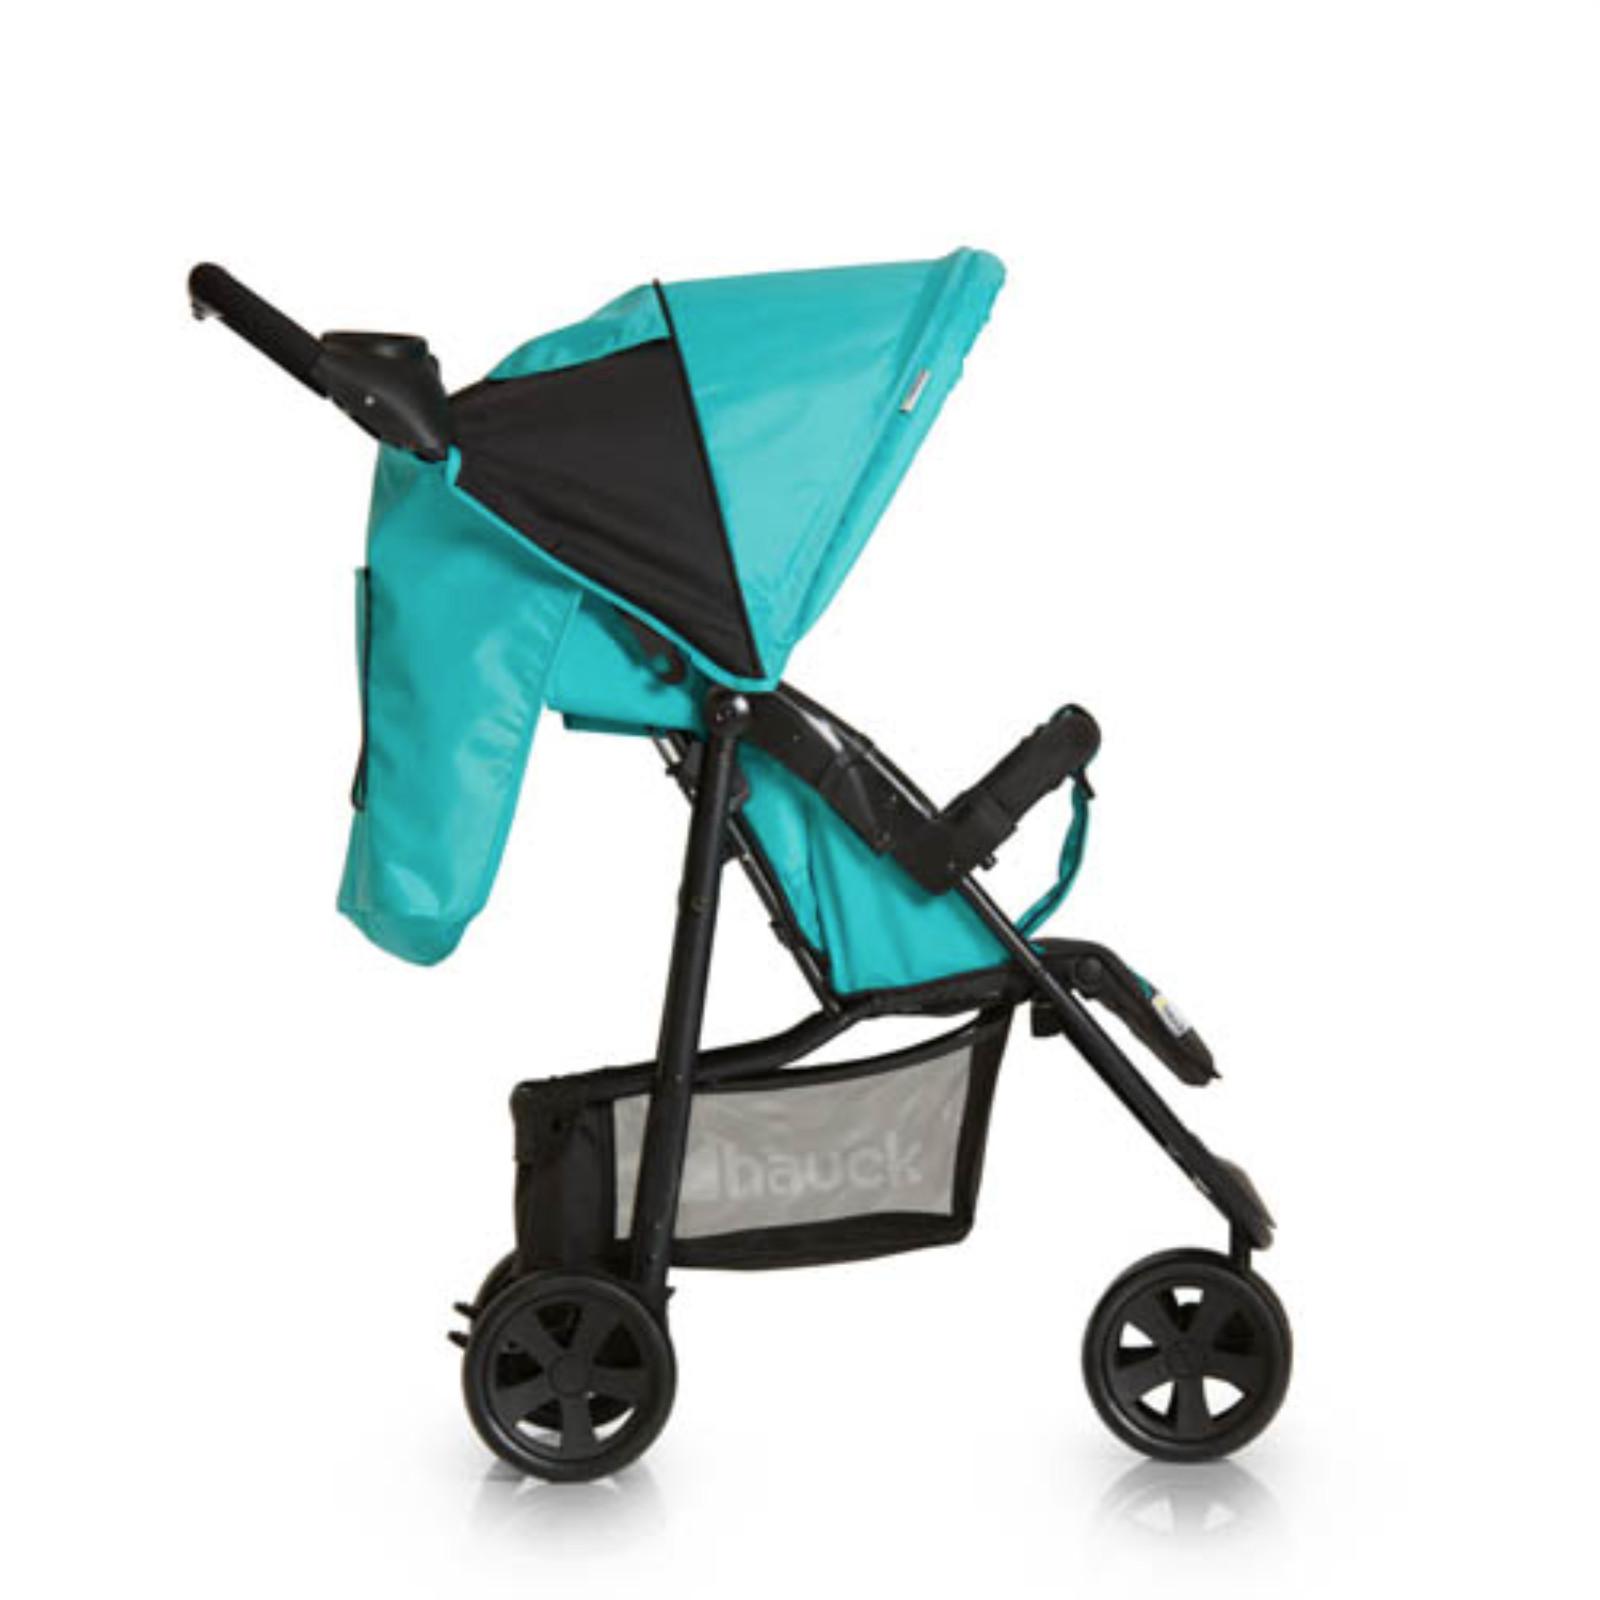 hauck citi neo ii stroller pushchair caviar aqua. Black Bedroom Furniture Sets. Home Design Ideas